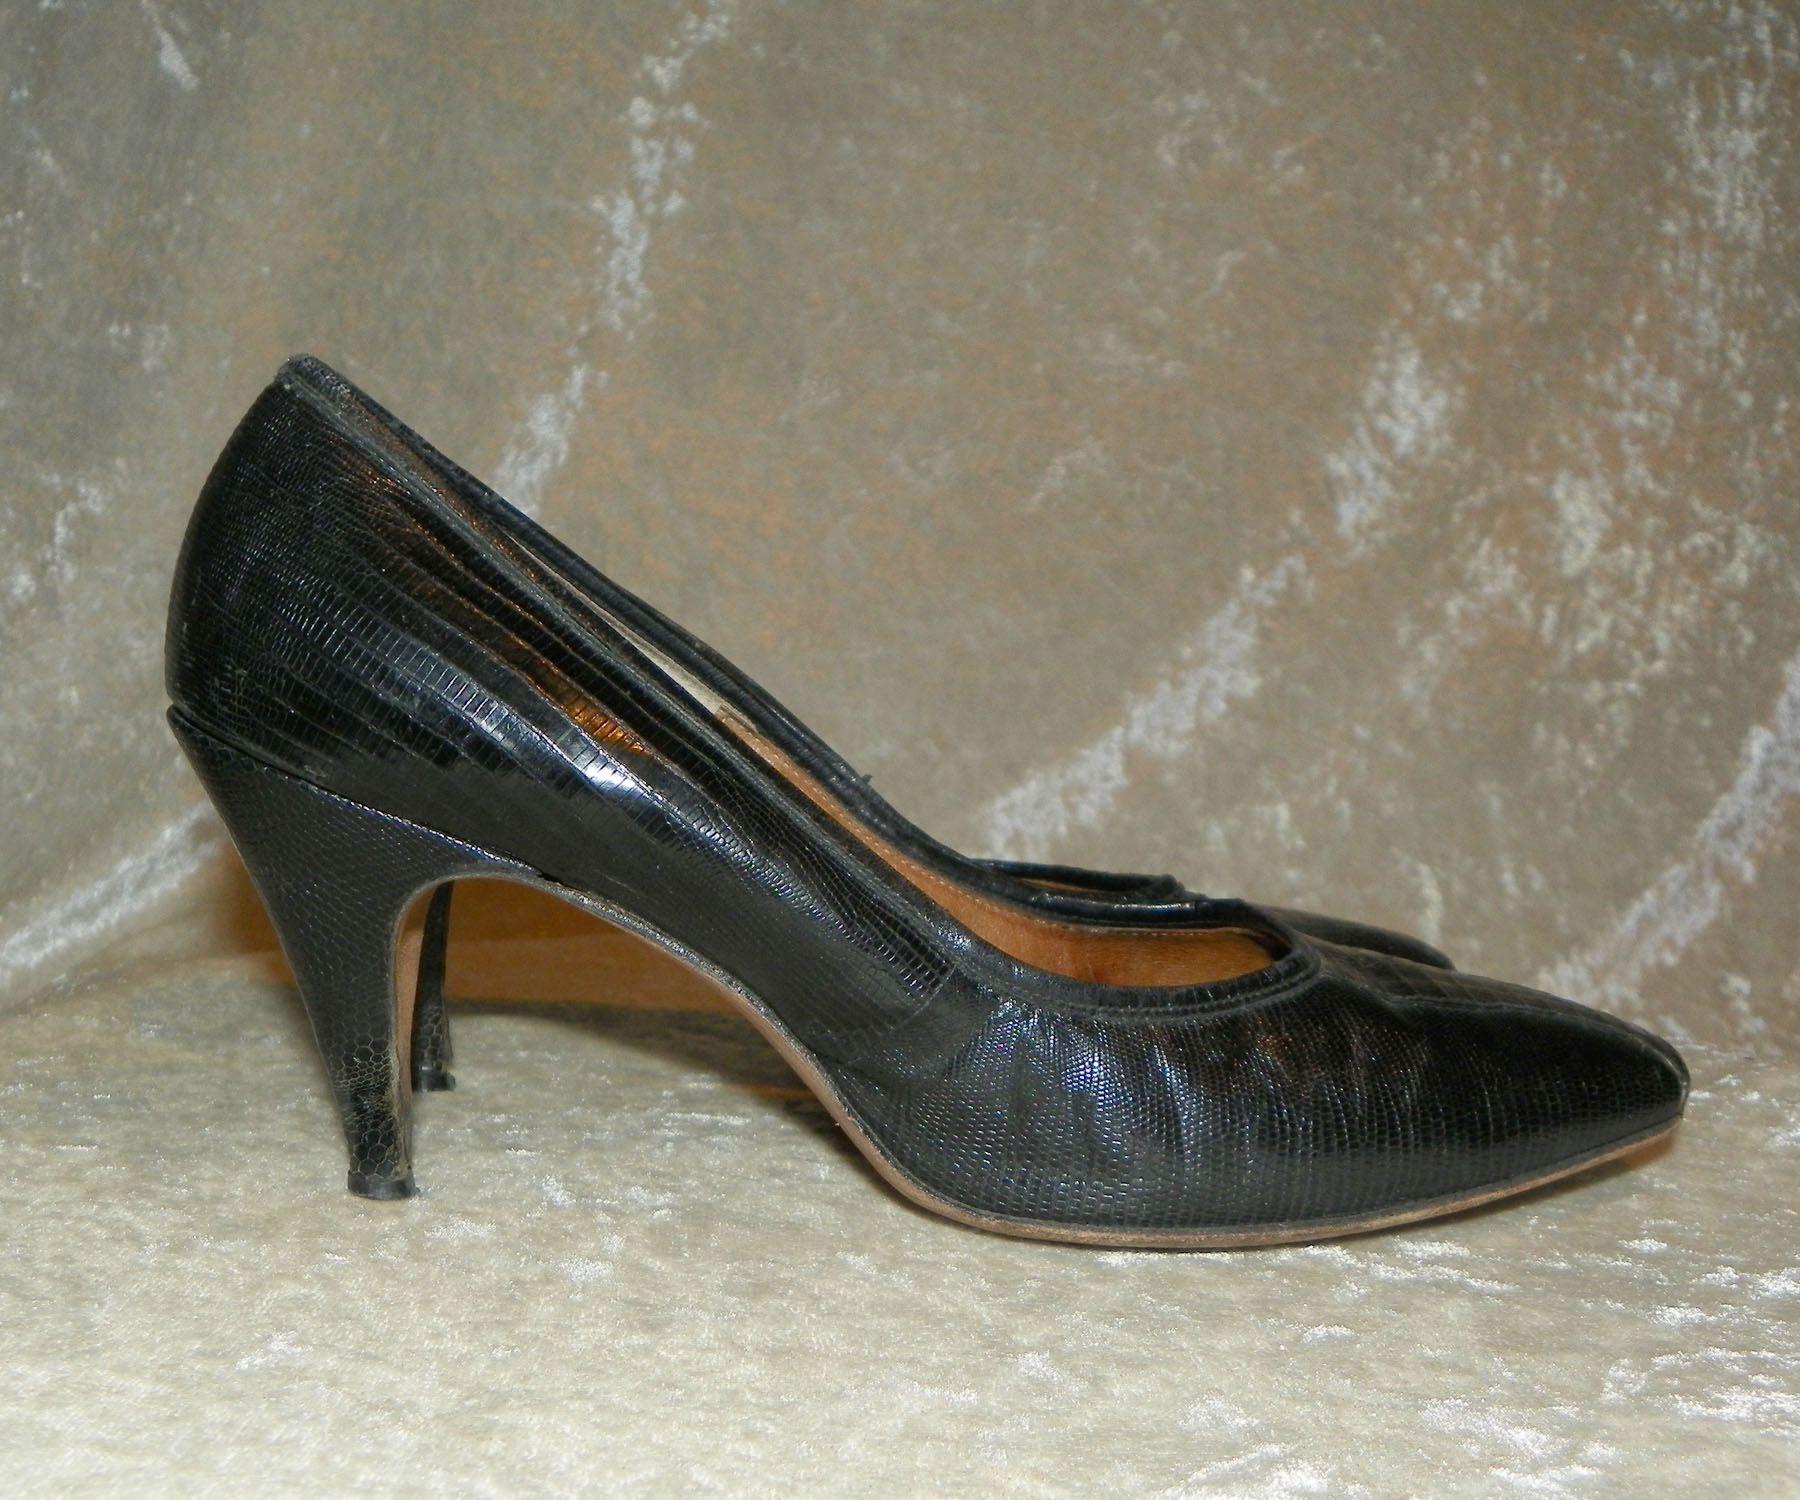 bc8cb8c9a936d Shoes Juliana Black Lizard Reptile Leather High Heels 195…   Vintage ...